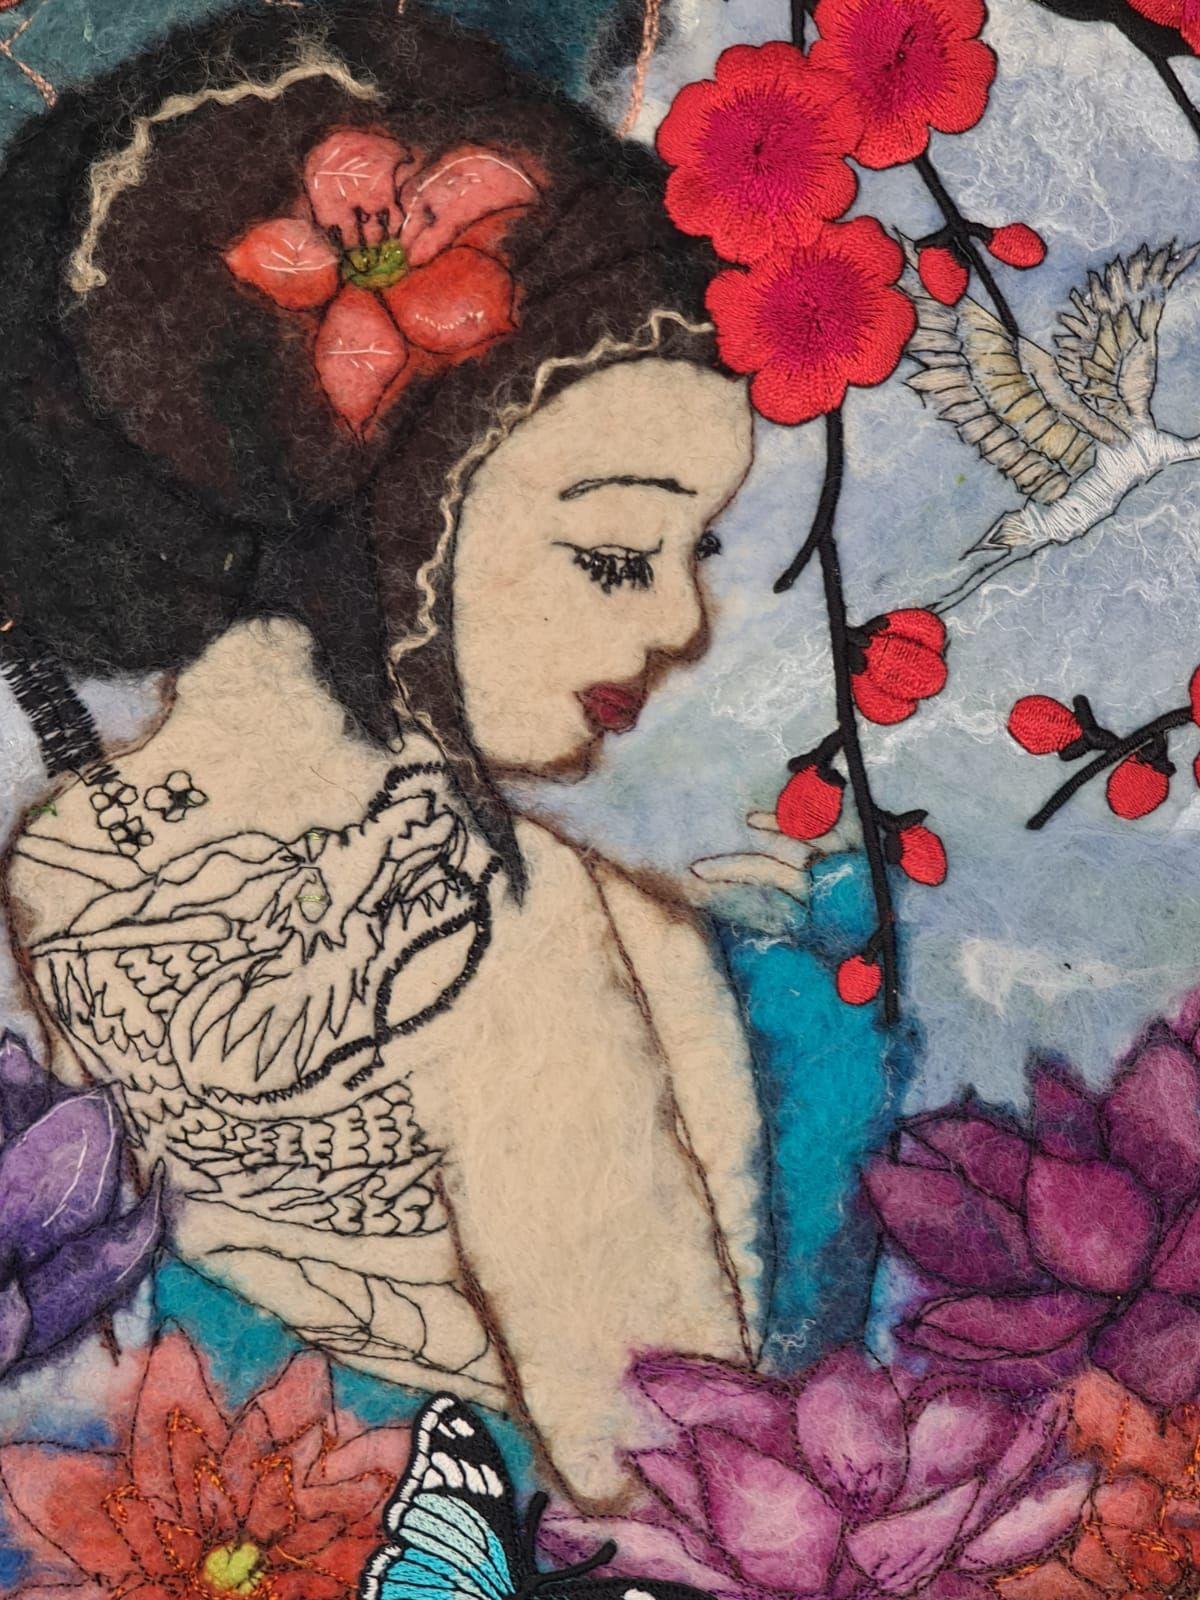 Framedwoman with a dragon tattoo felt fibre wall art